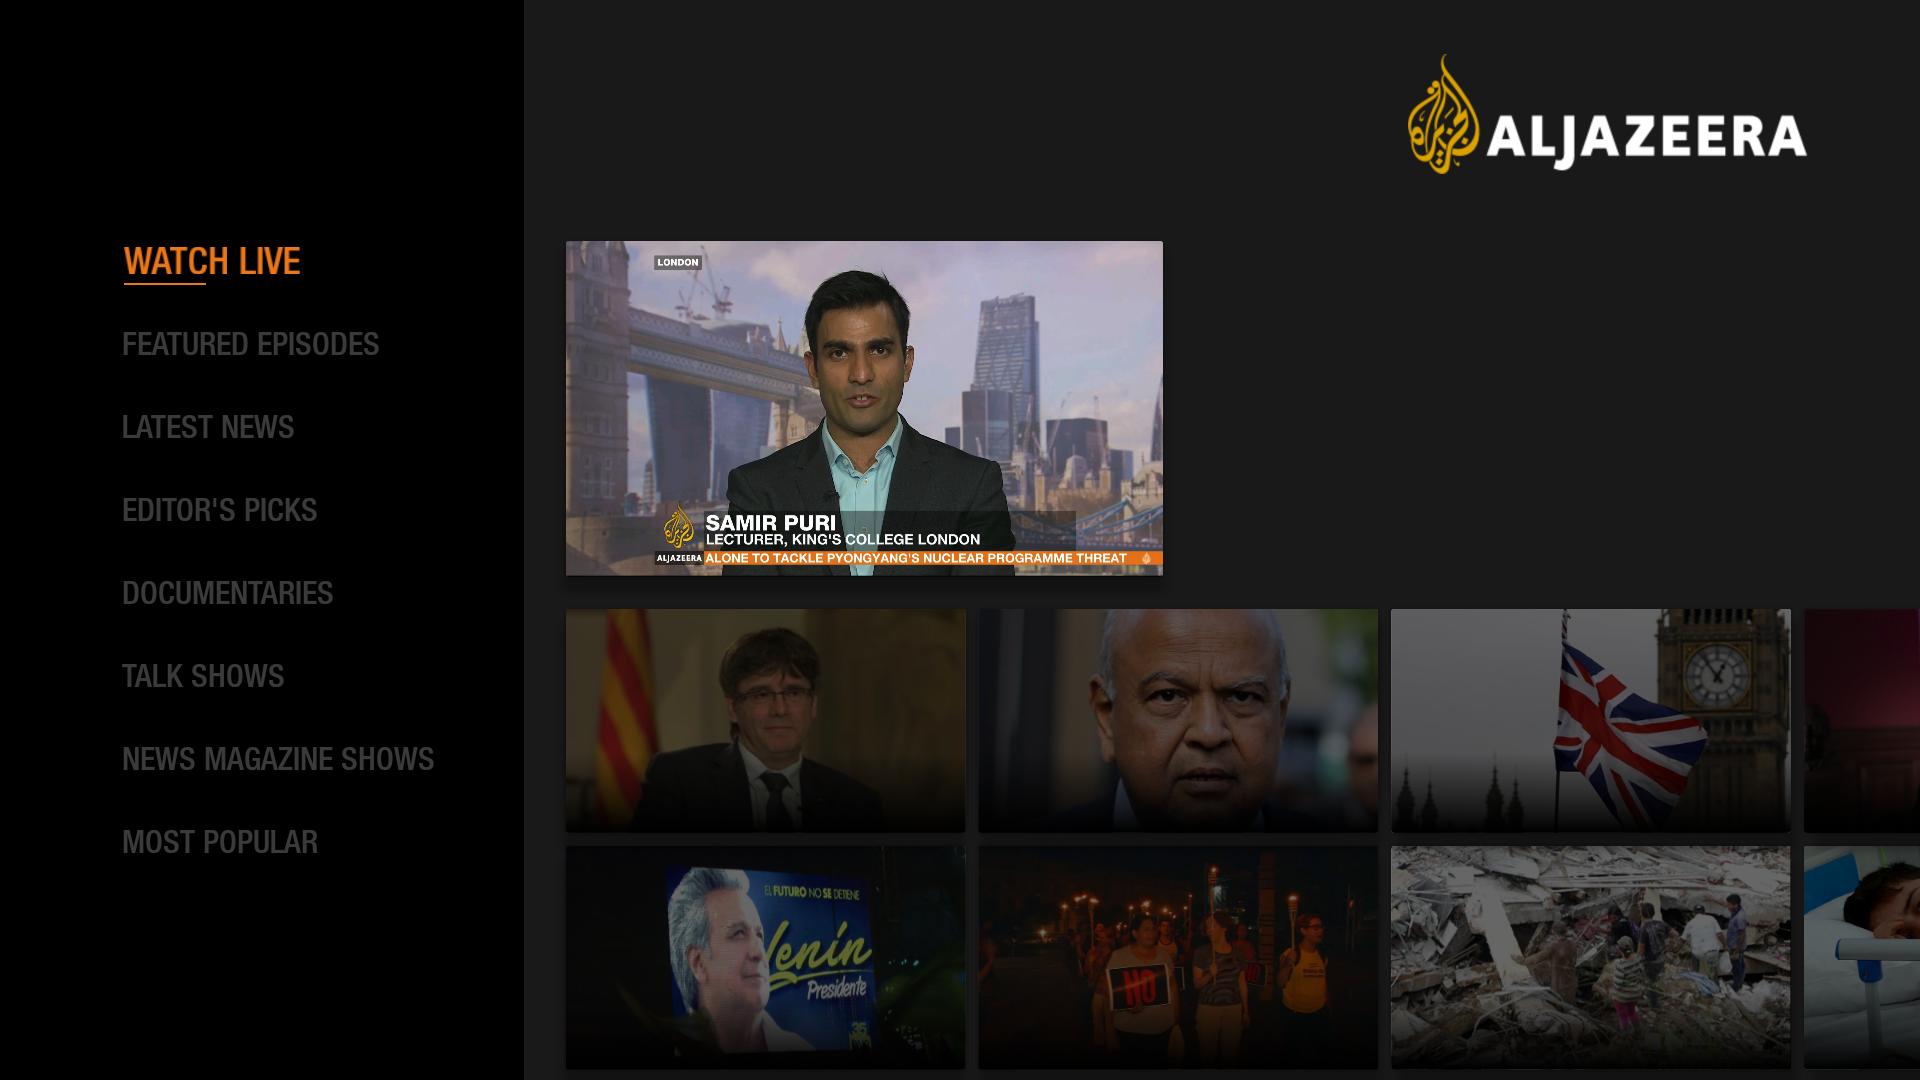 Amazon.com: Al Jazeera: Appstore for Android